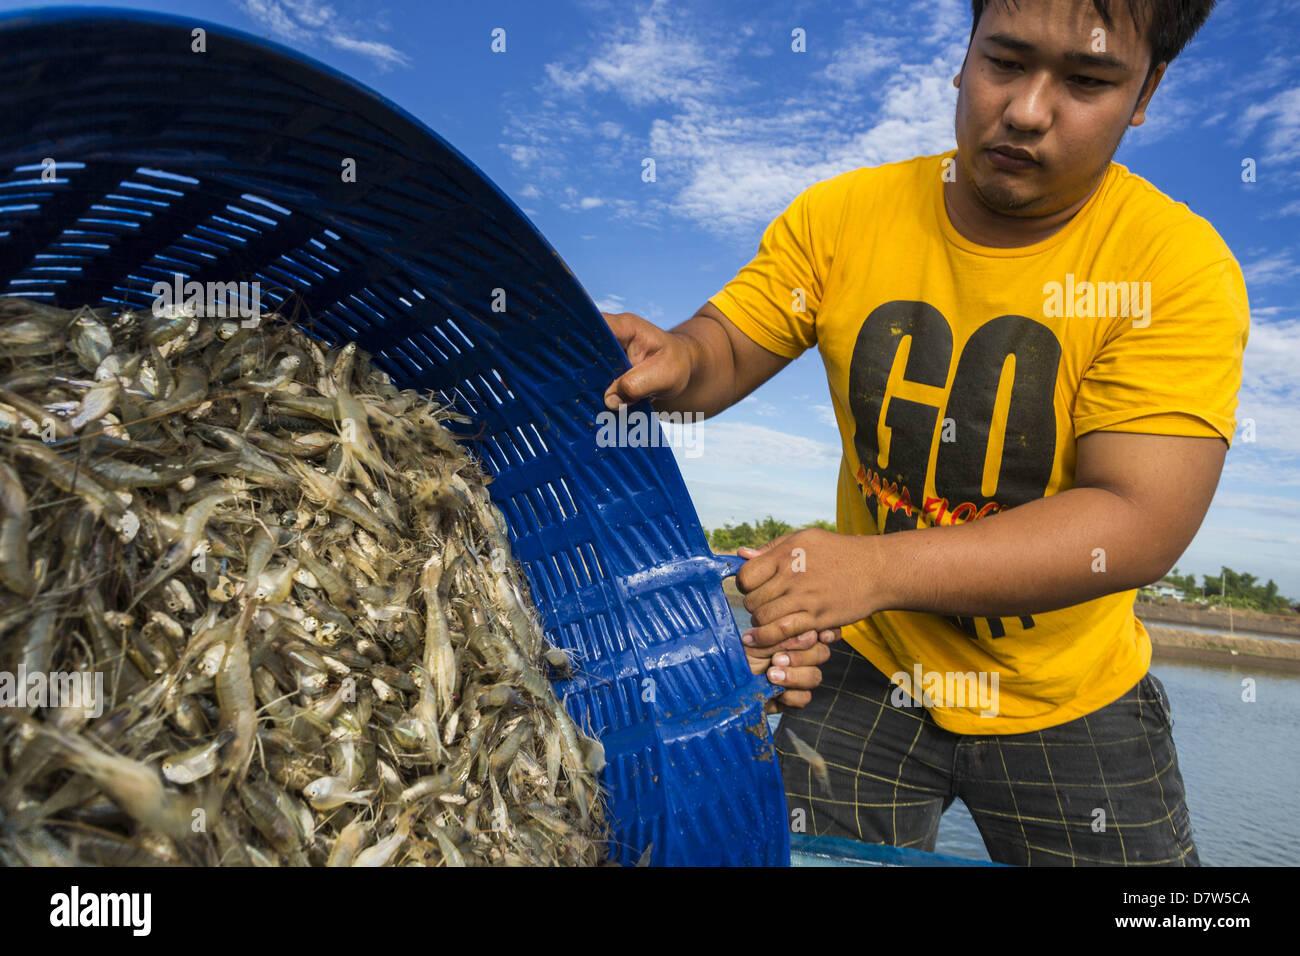 May 14, 2013 - Bangtathen, Saphun Buri, Thailand - A man dumps baskets of shrimp into a water tank on the back of Stock Photo